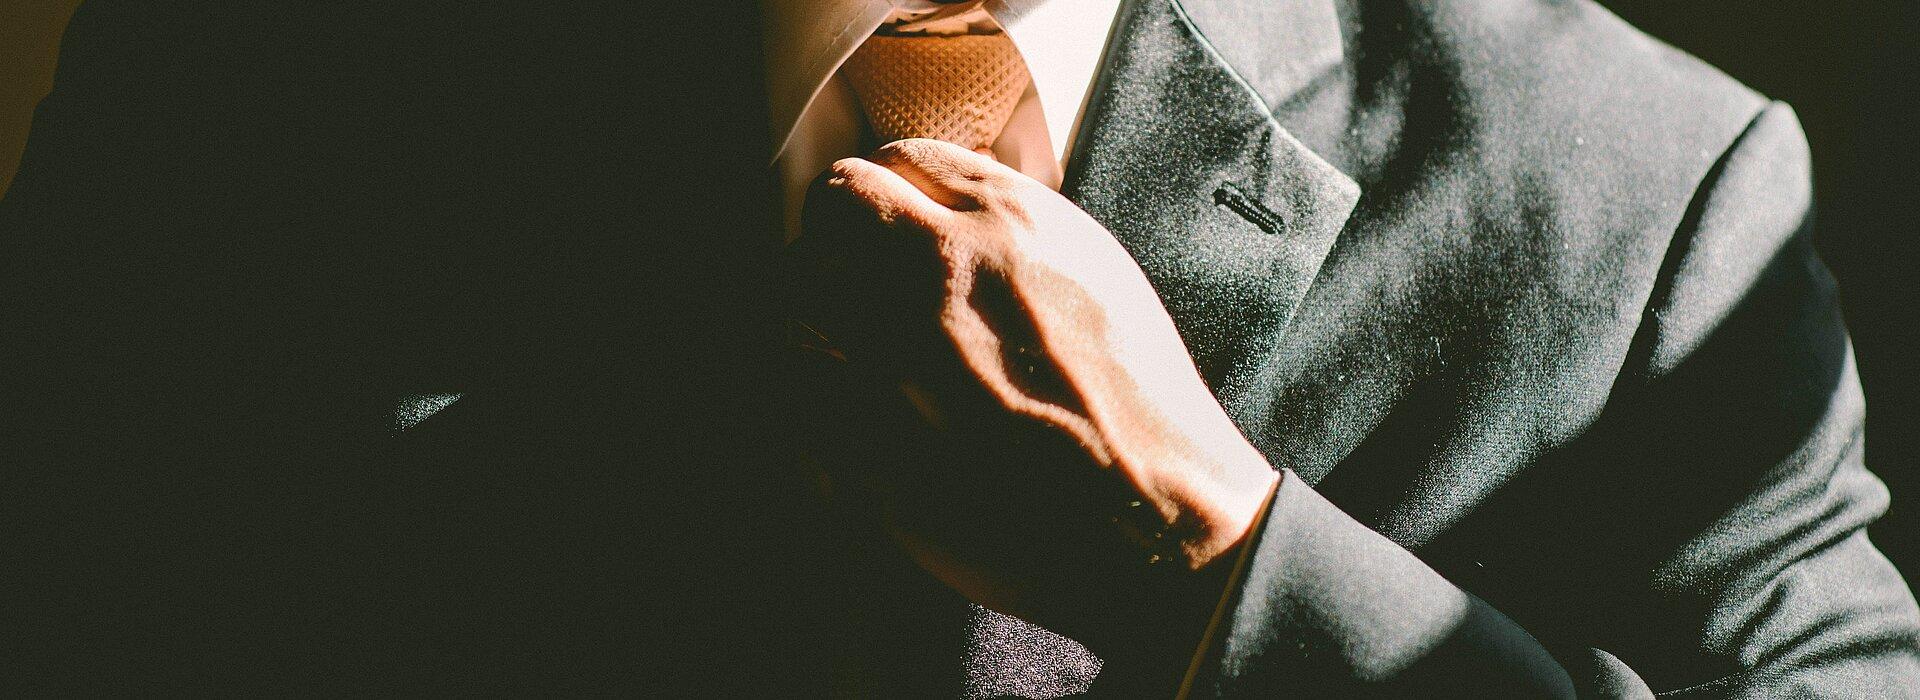 homem ajeitando gravata do terno